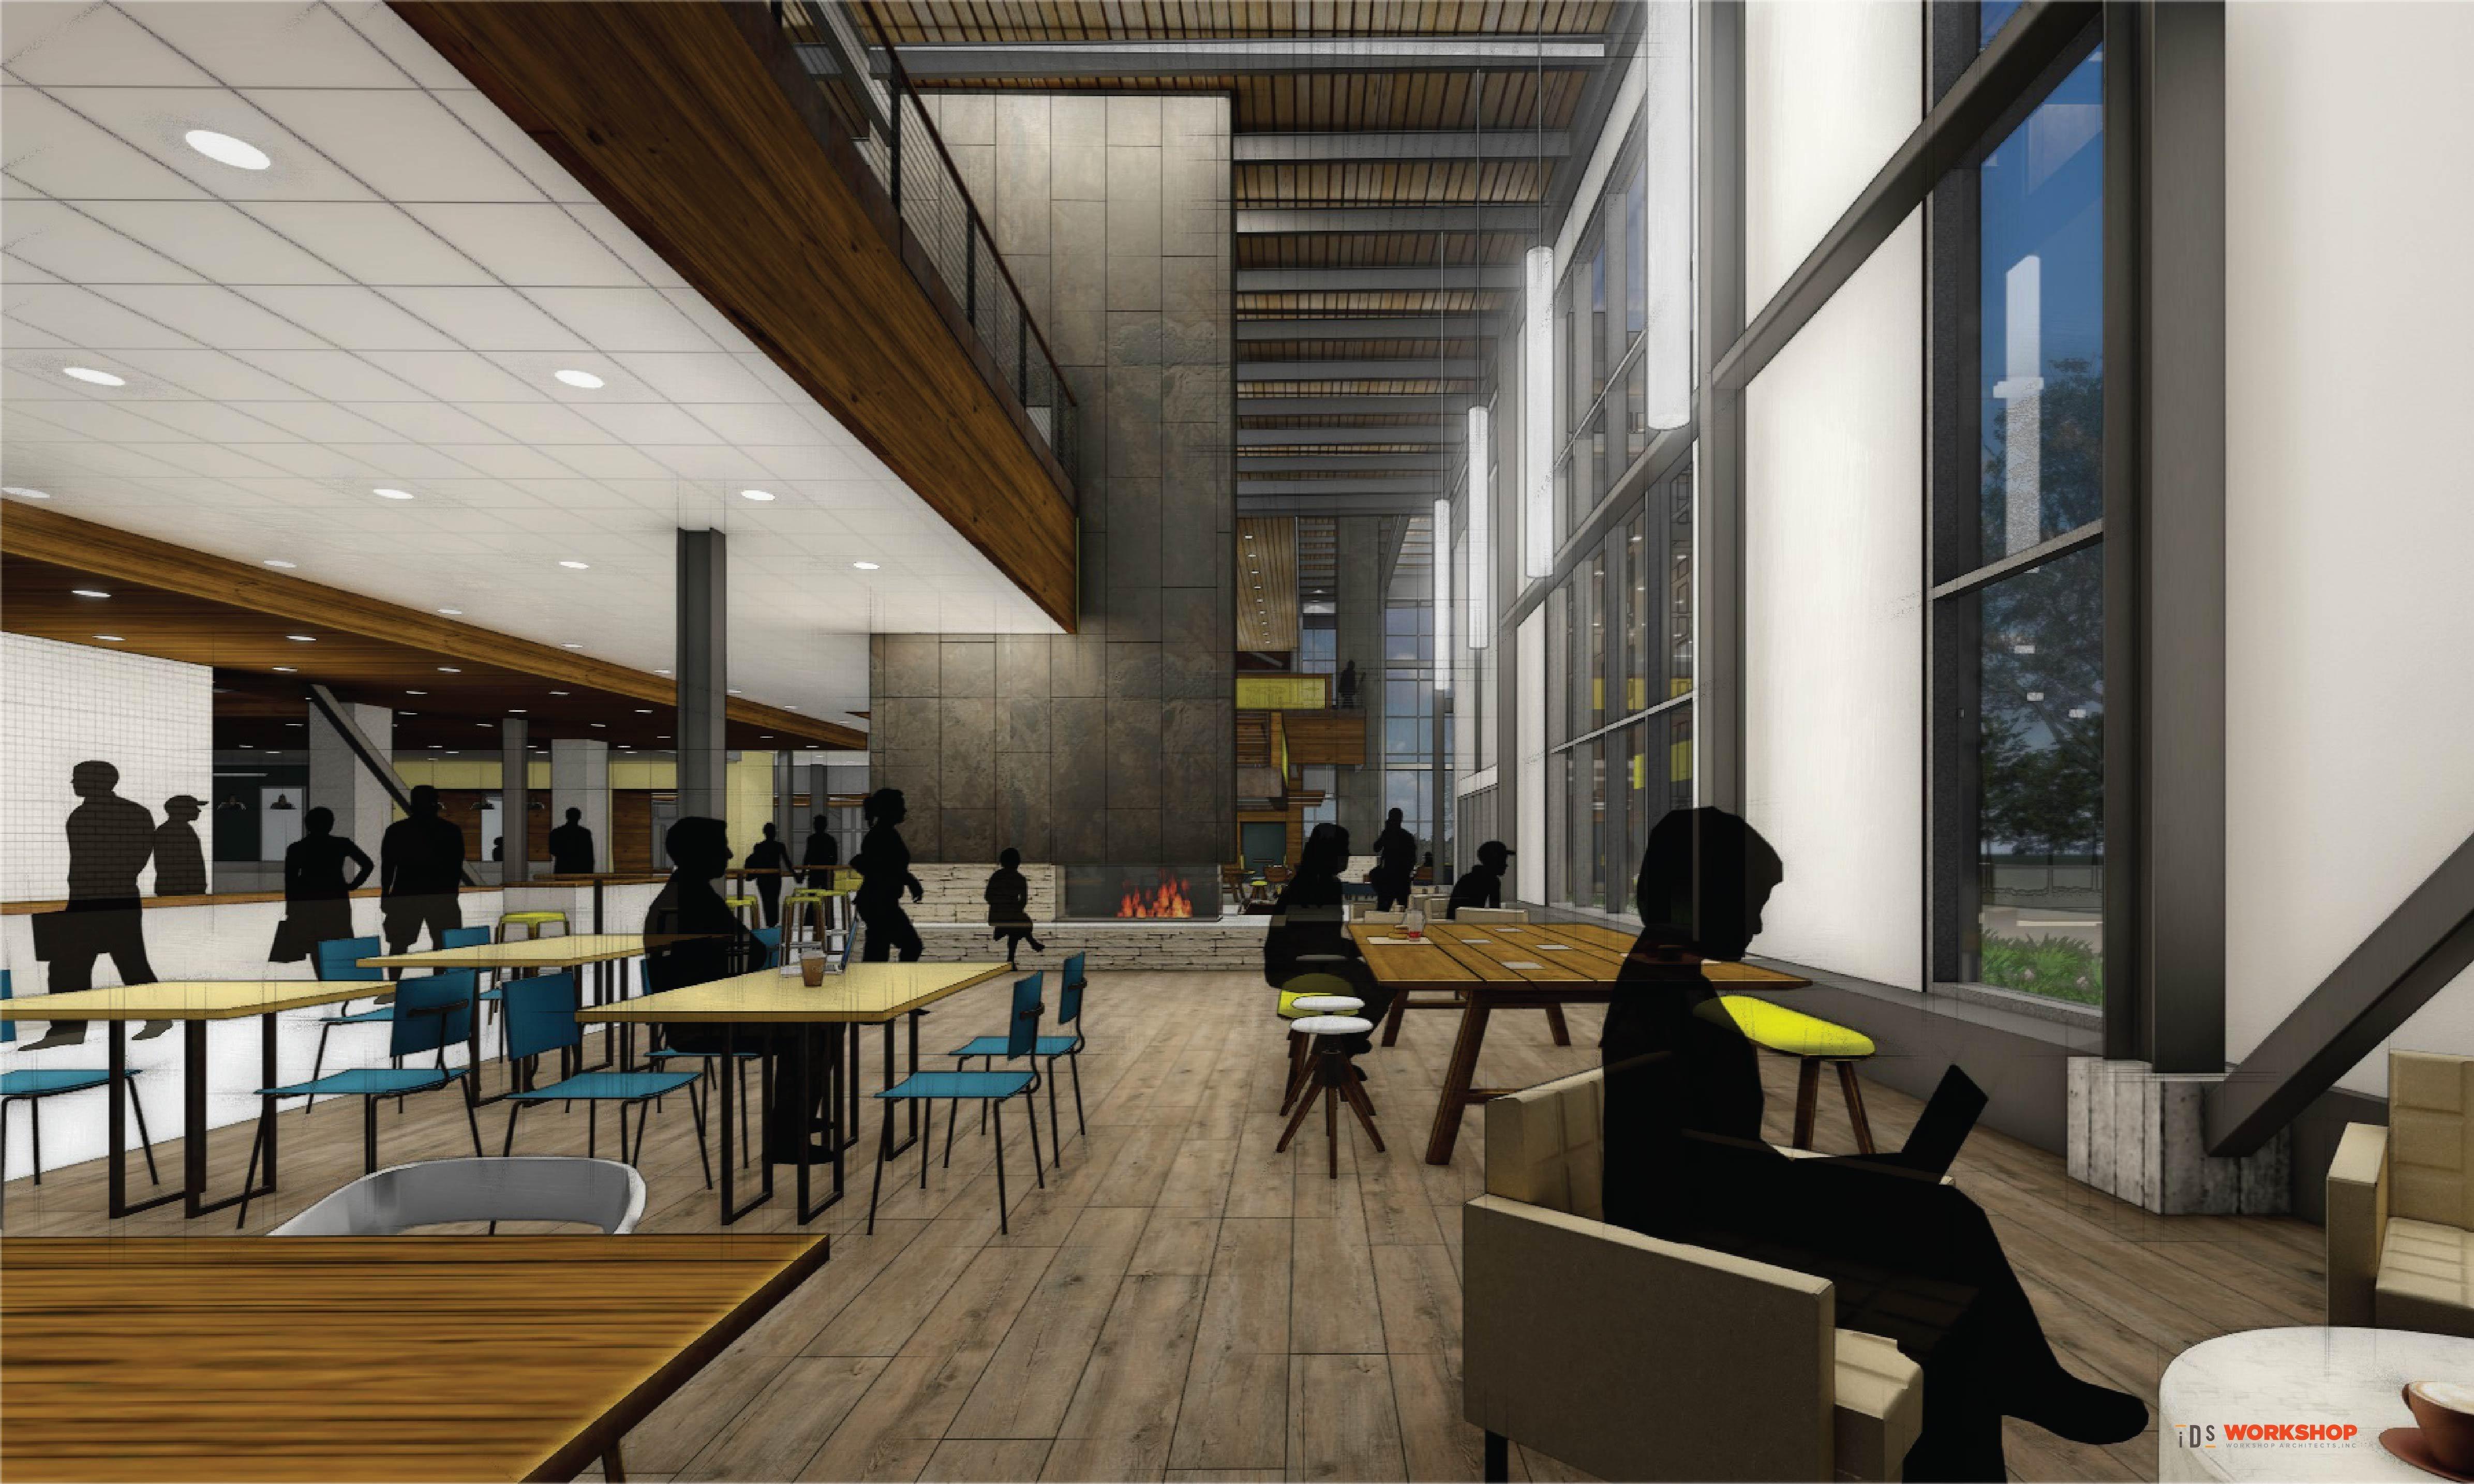 Oakland Center Expansion